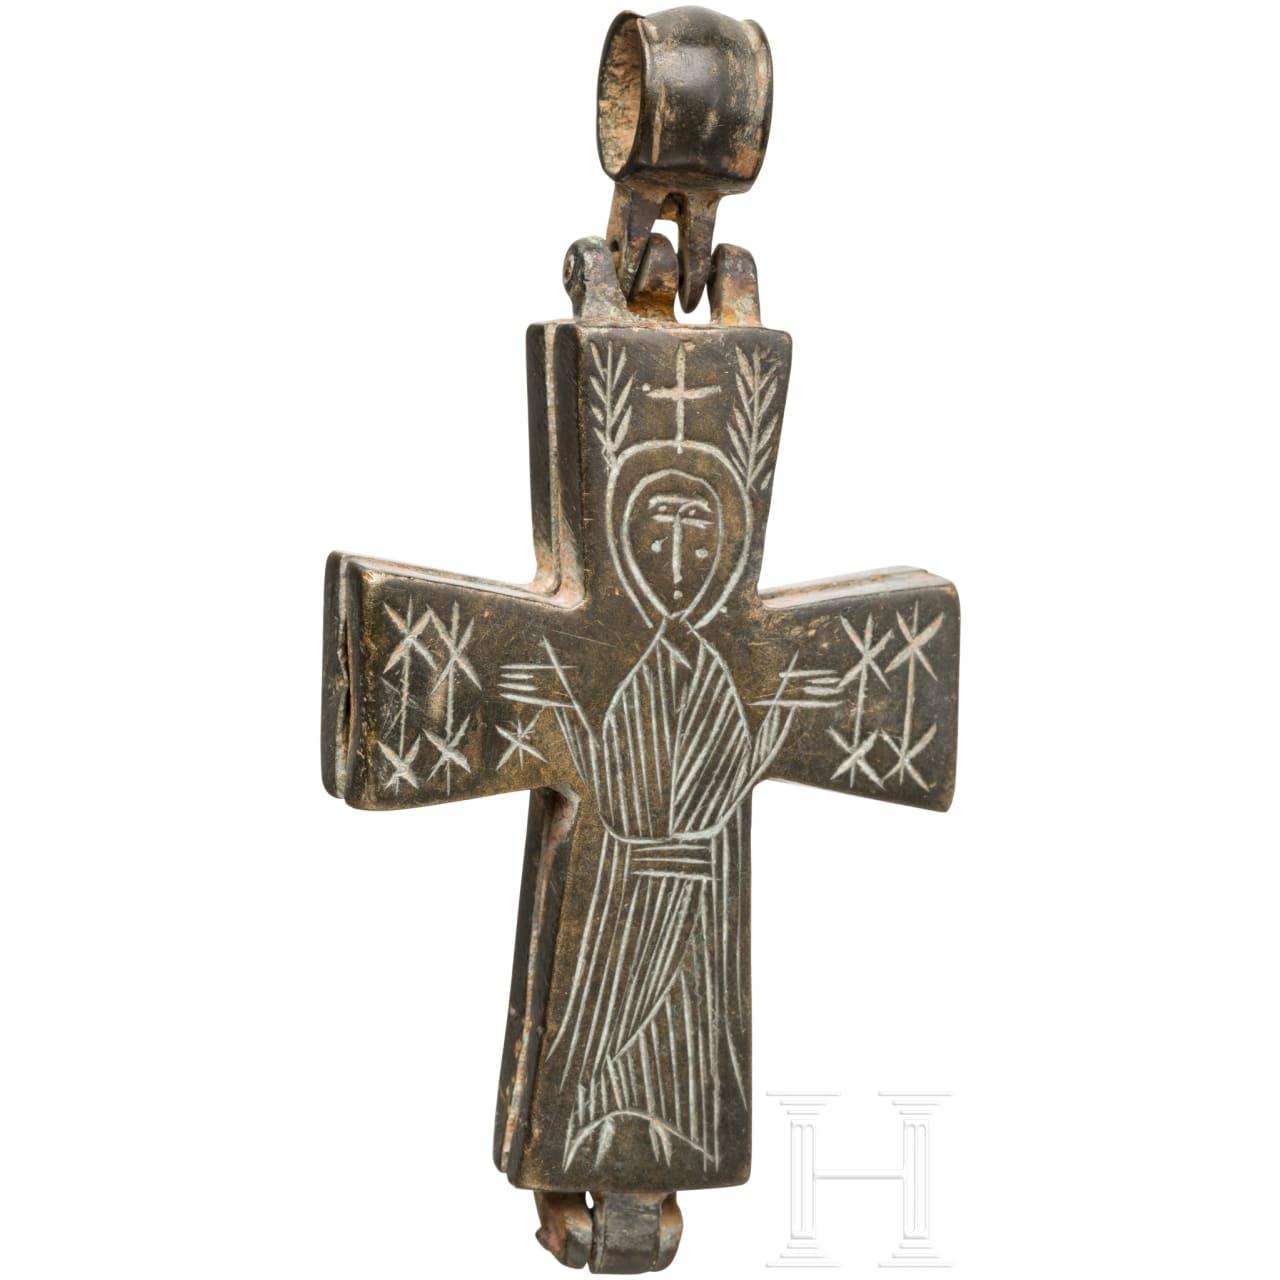 Bronzenes Enkolpion, mittelbyzantinisch, 9. - 11. Jhdt.